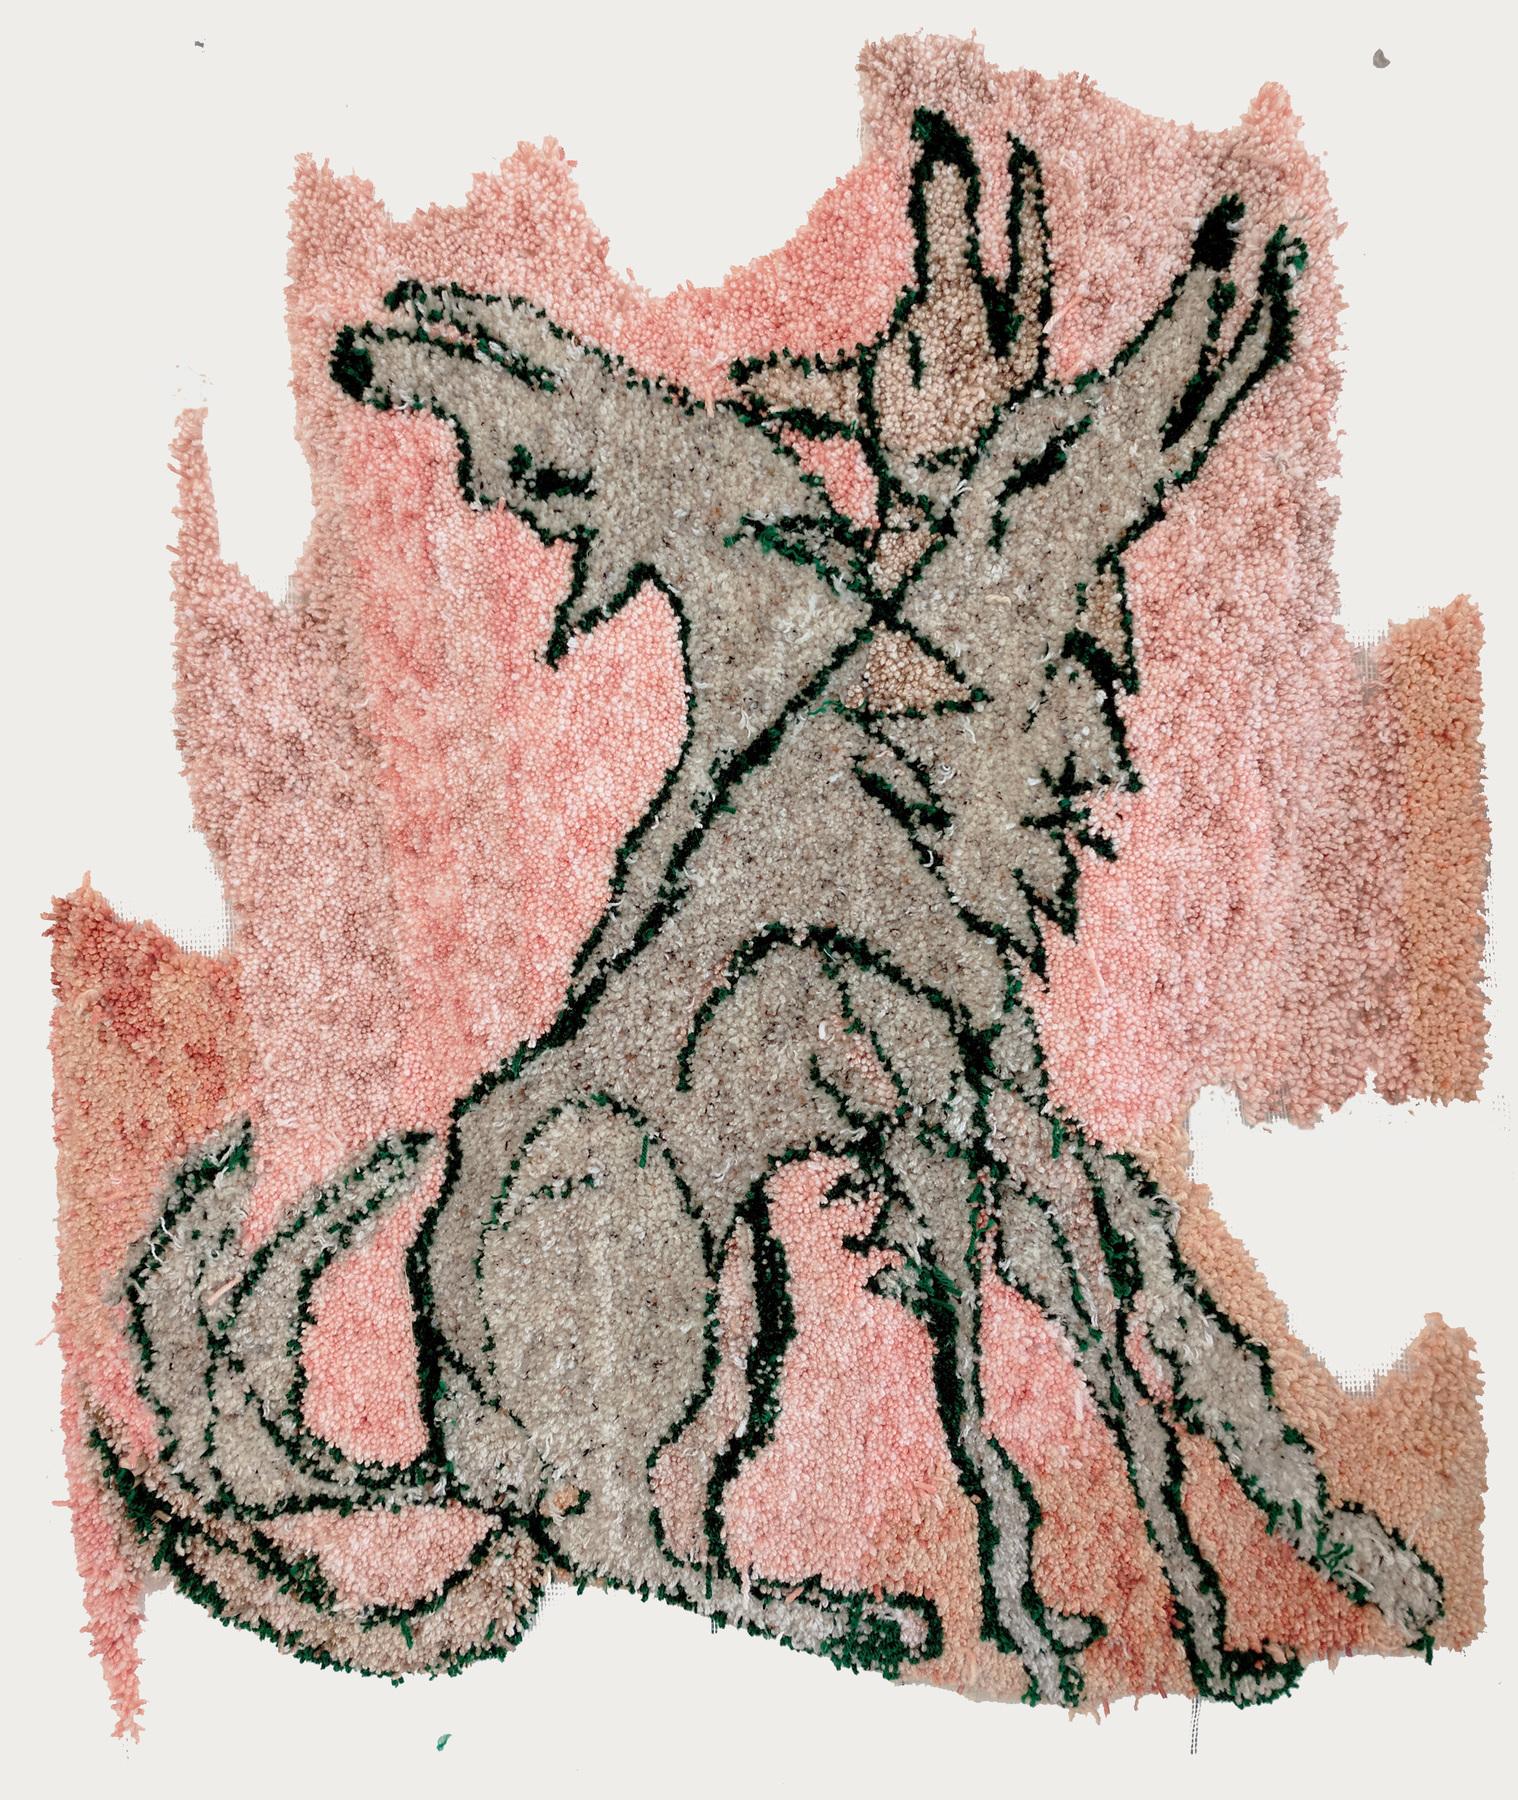 Johnny DeFeo Wolf Stretch tufted yarn 2018 tapestry